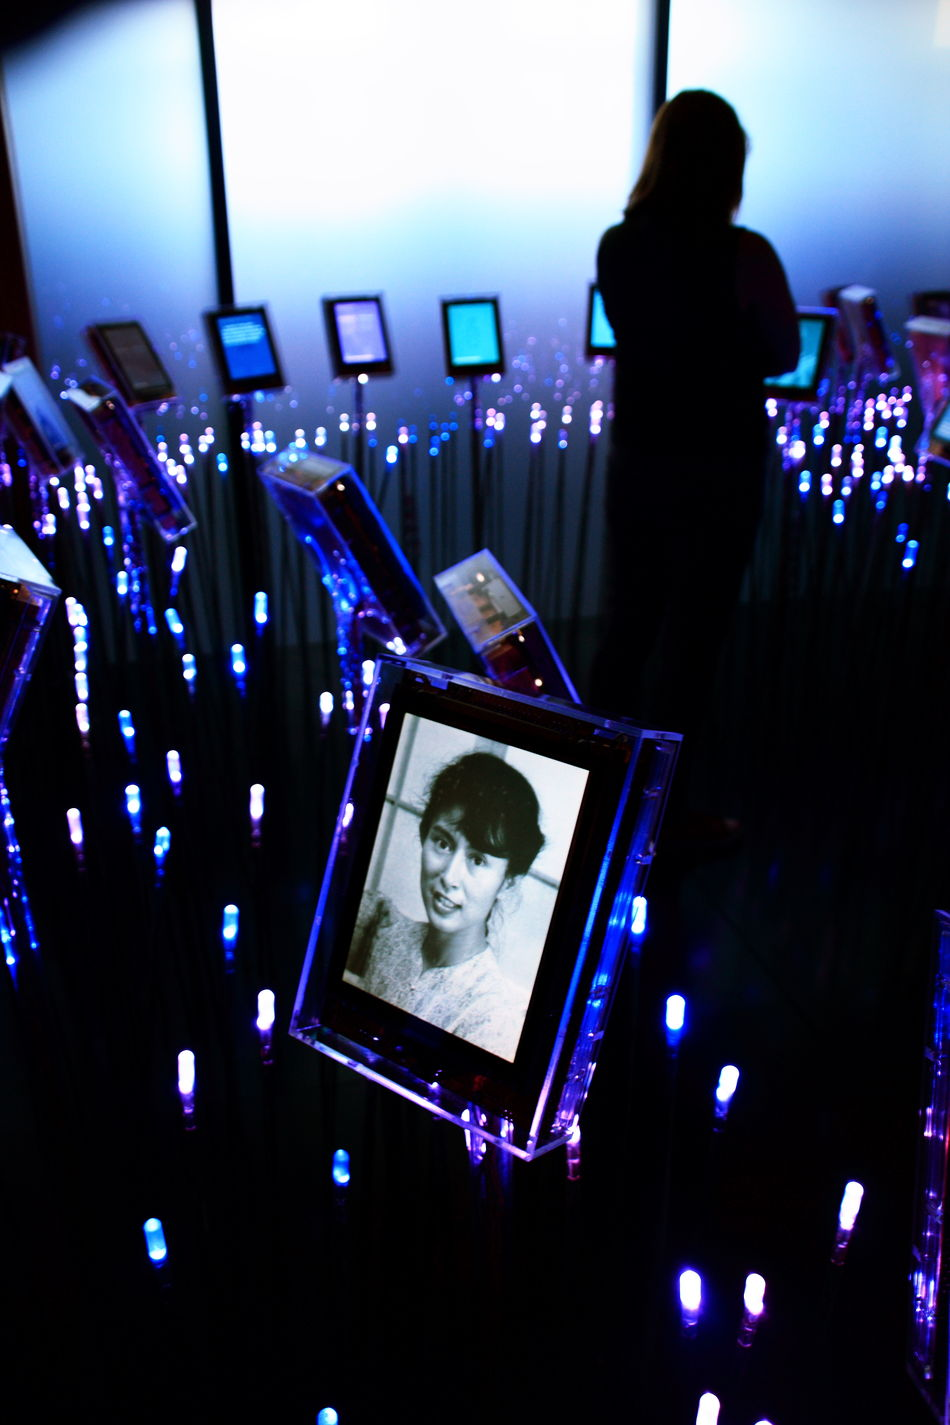 All The Neon Lights Neon Nobel Peace Prize Nobel Prize Oslo Portrait Portrait Of A Woman Silhouette